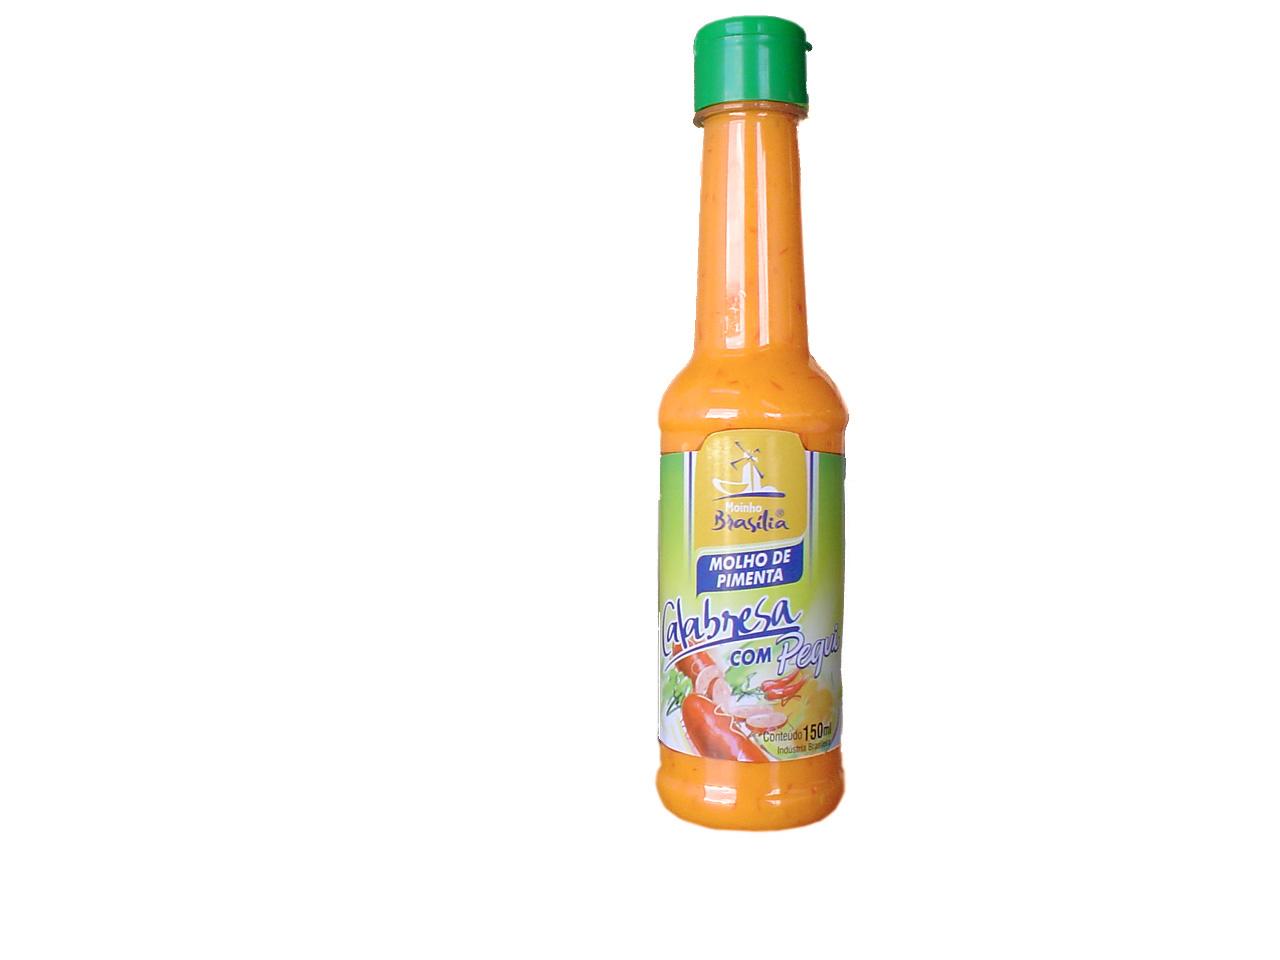 Cod.352-Molho pimenta Calabreza com pequi 150ml